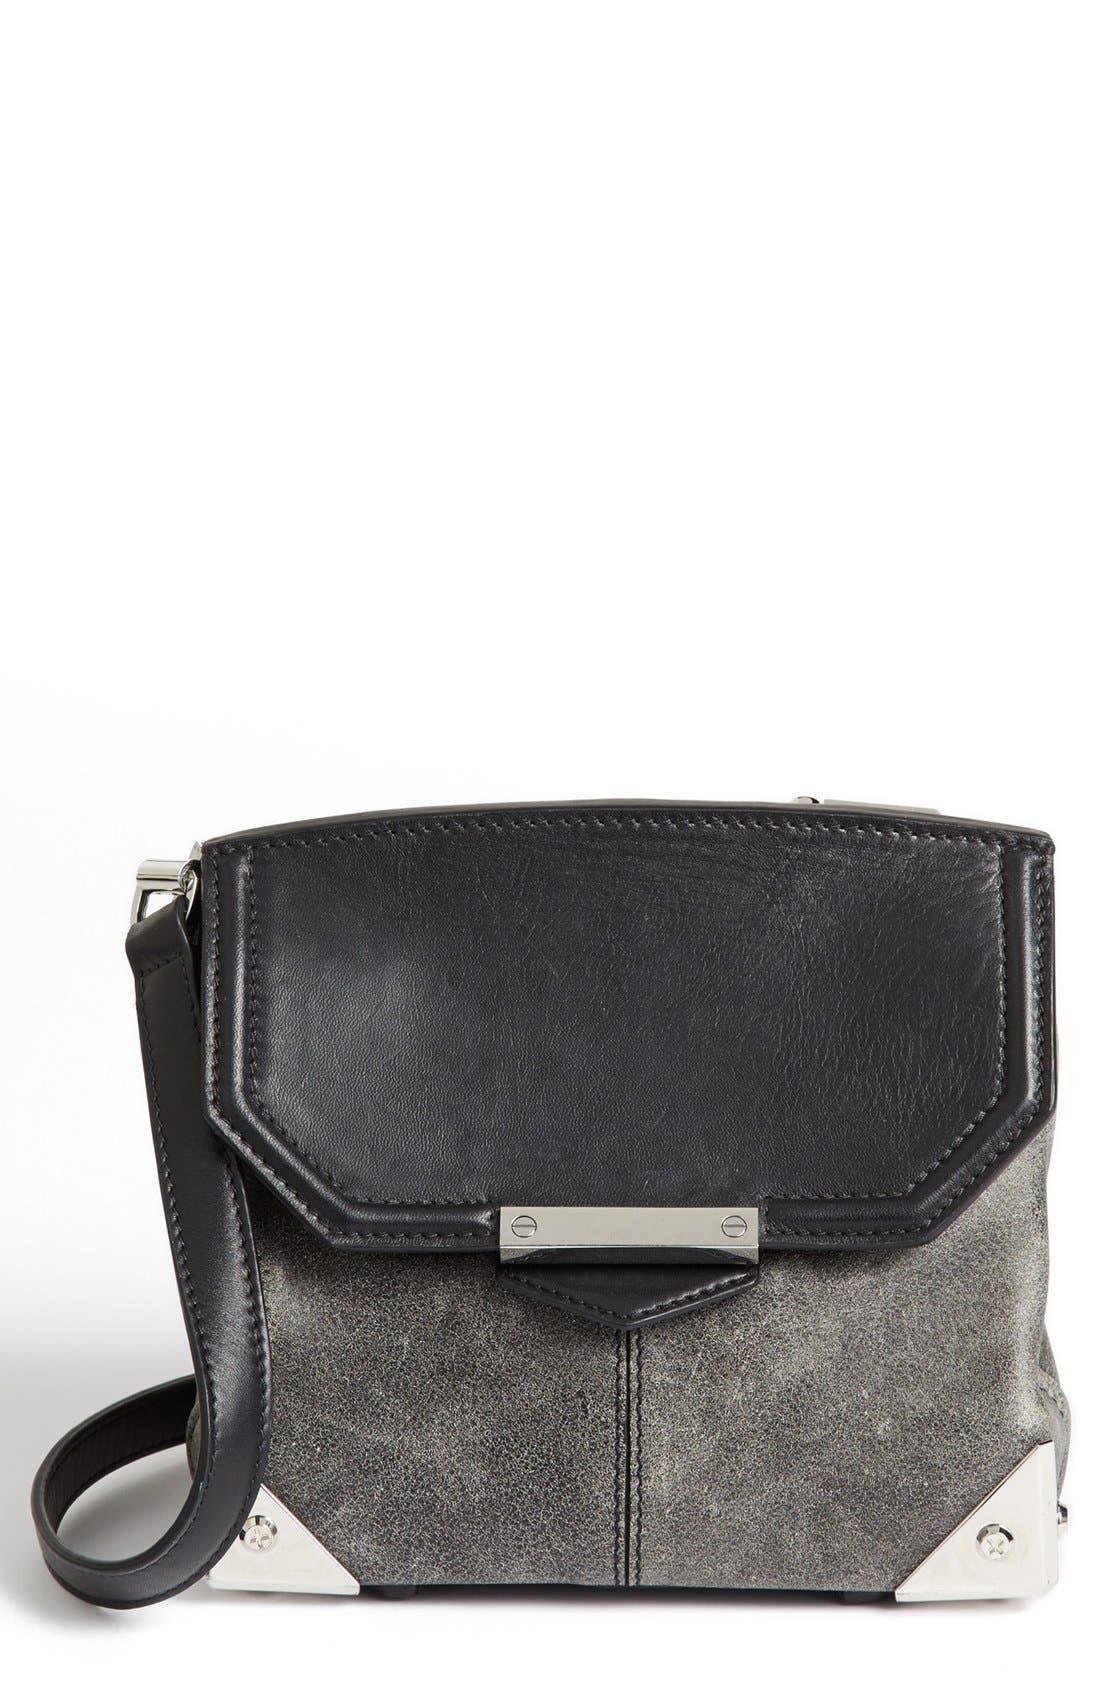 Alternate Image 1 Selected - Alexander Wang 'Marion' Distressed Leather Crossbody Bag